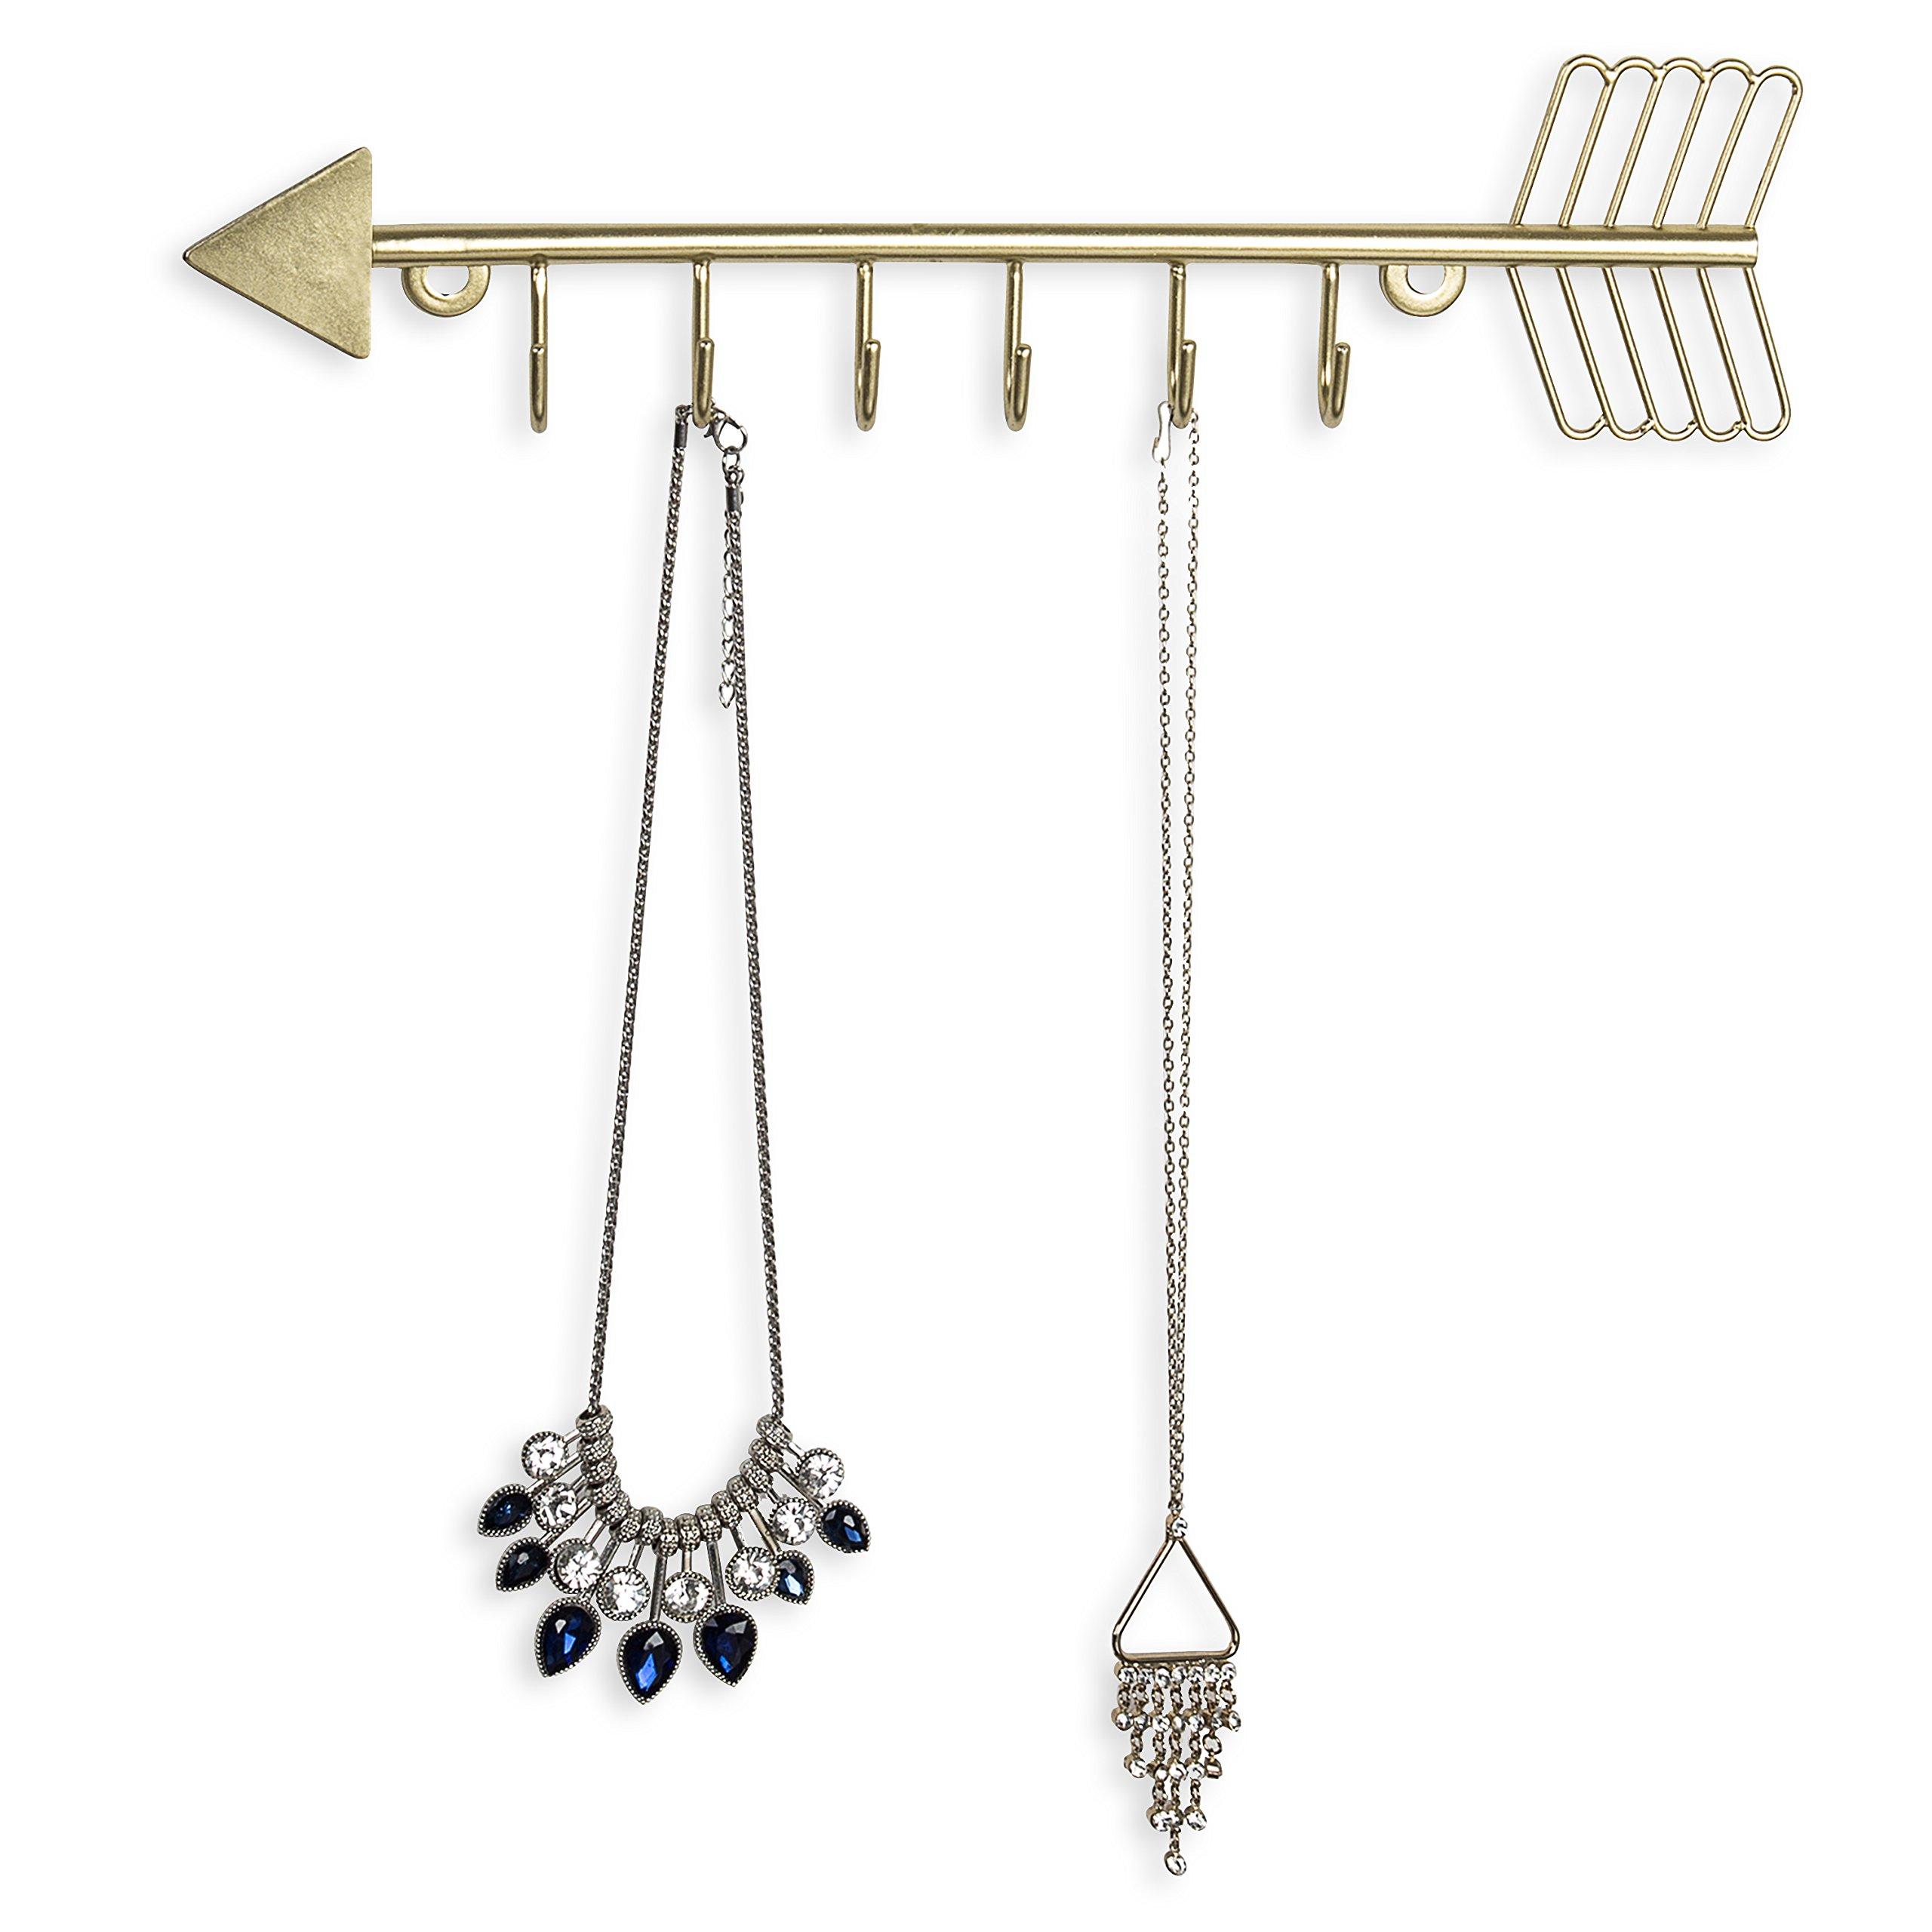 Arrow Design Wall Mounted Brass-Tone Metal 6 Hook Necklace Organizer Hanging Rack